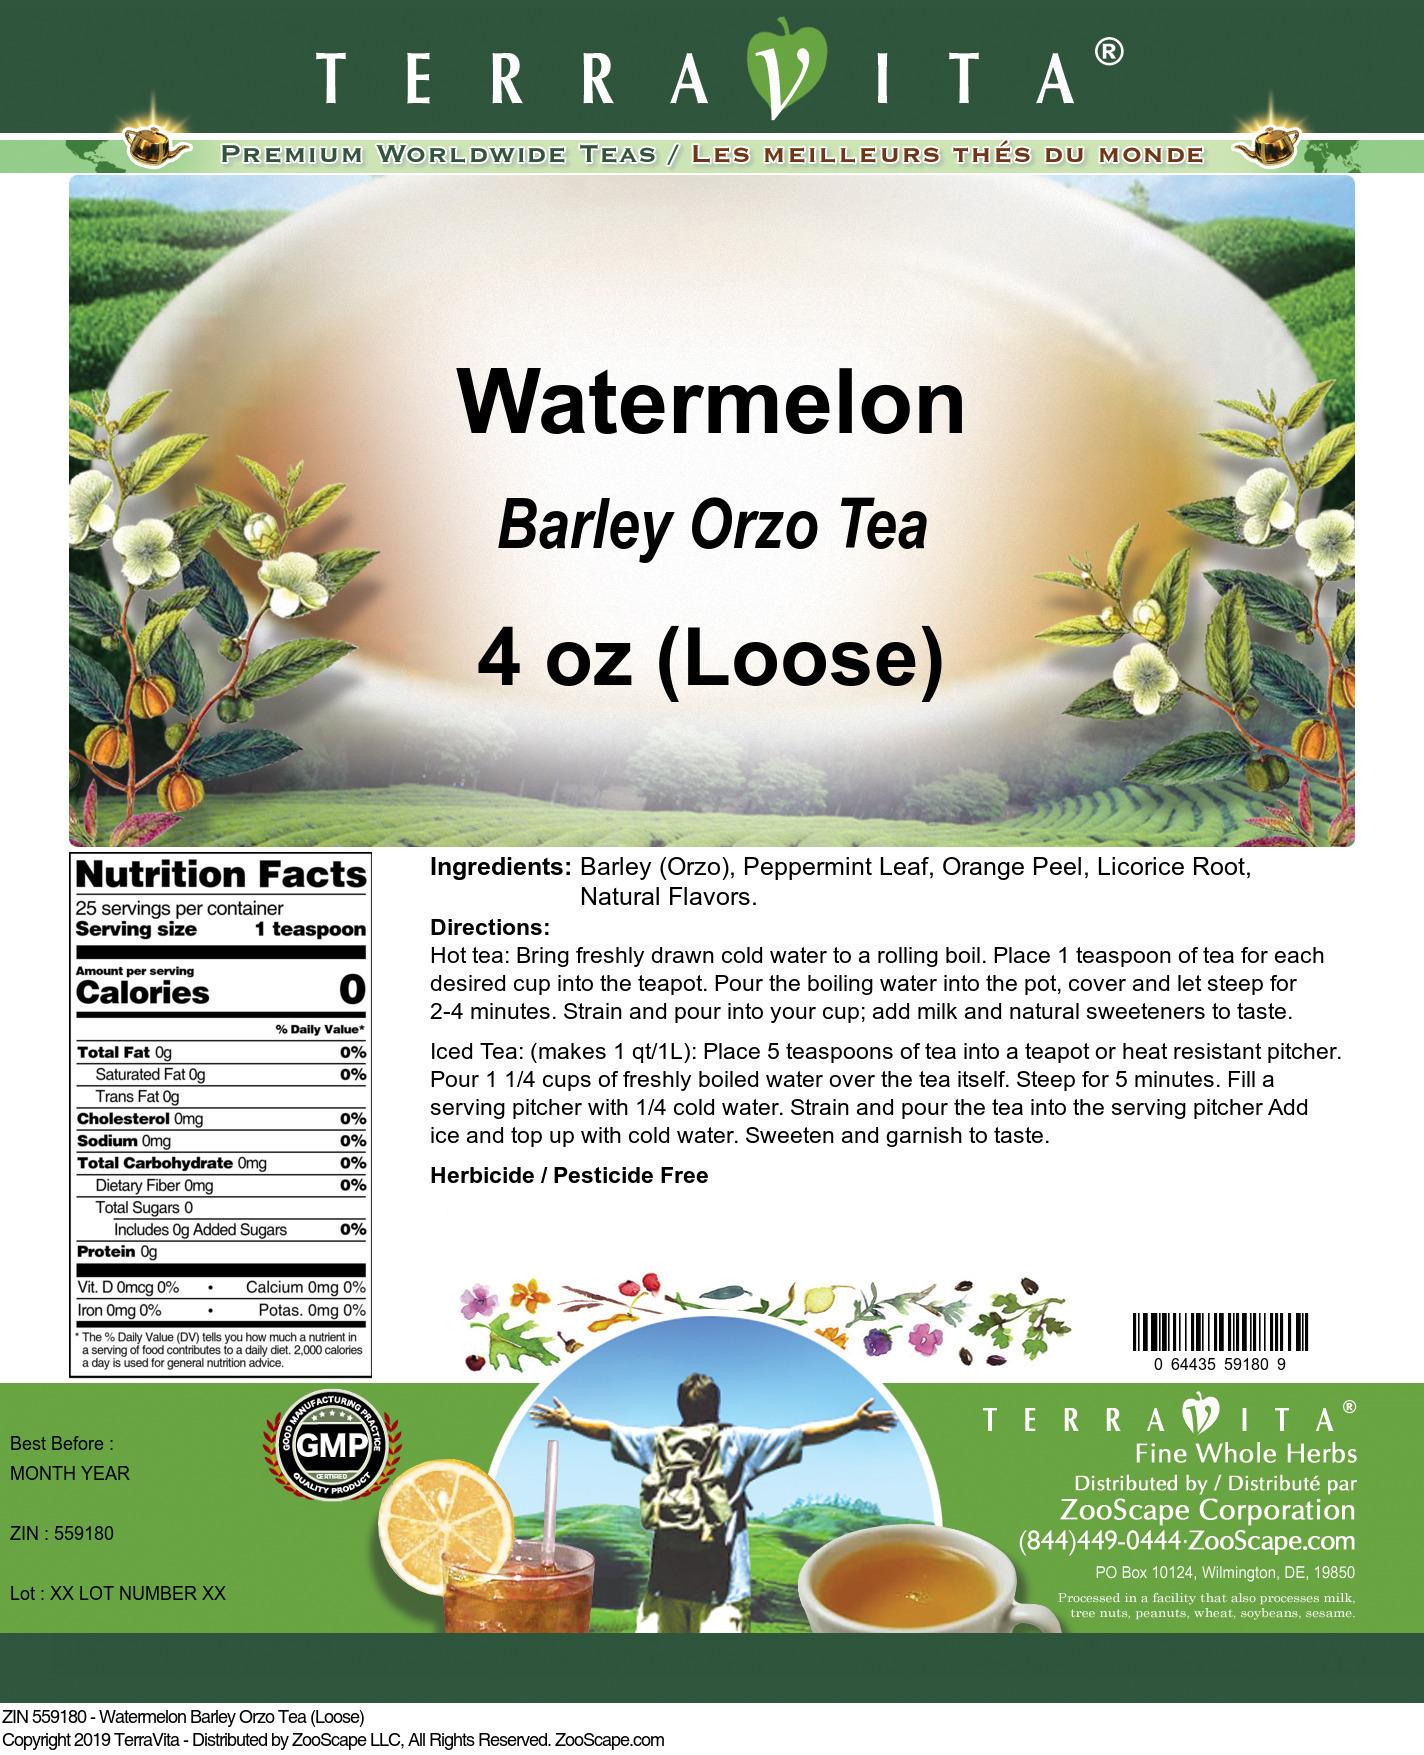 Watermelon Barley Orzo Tea (Loose)